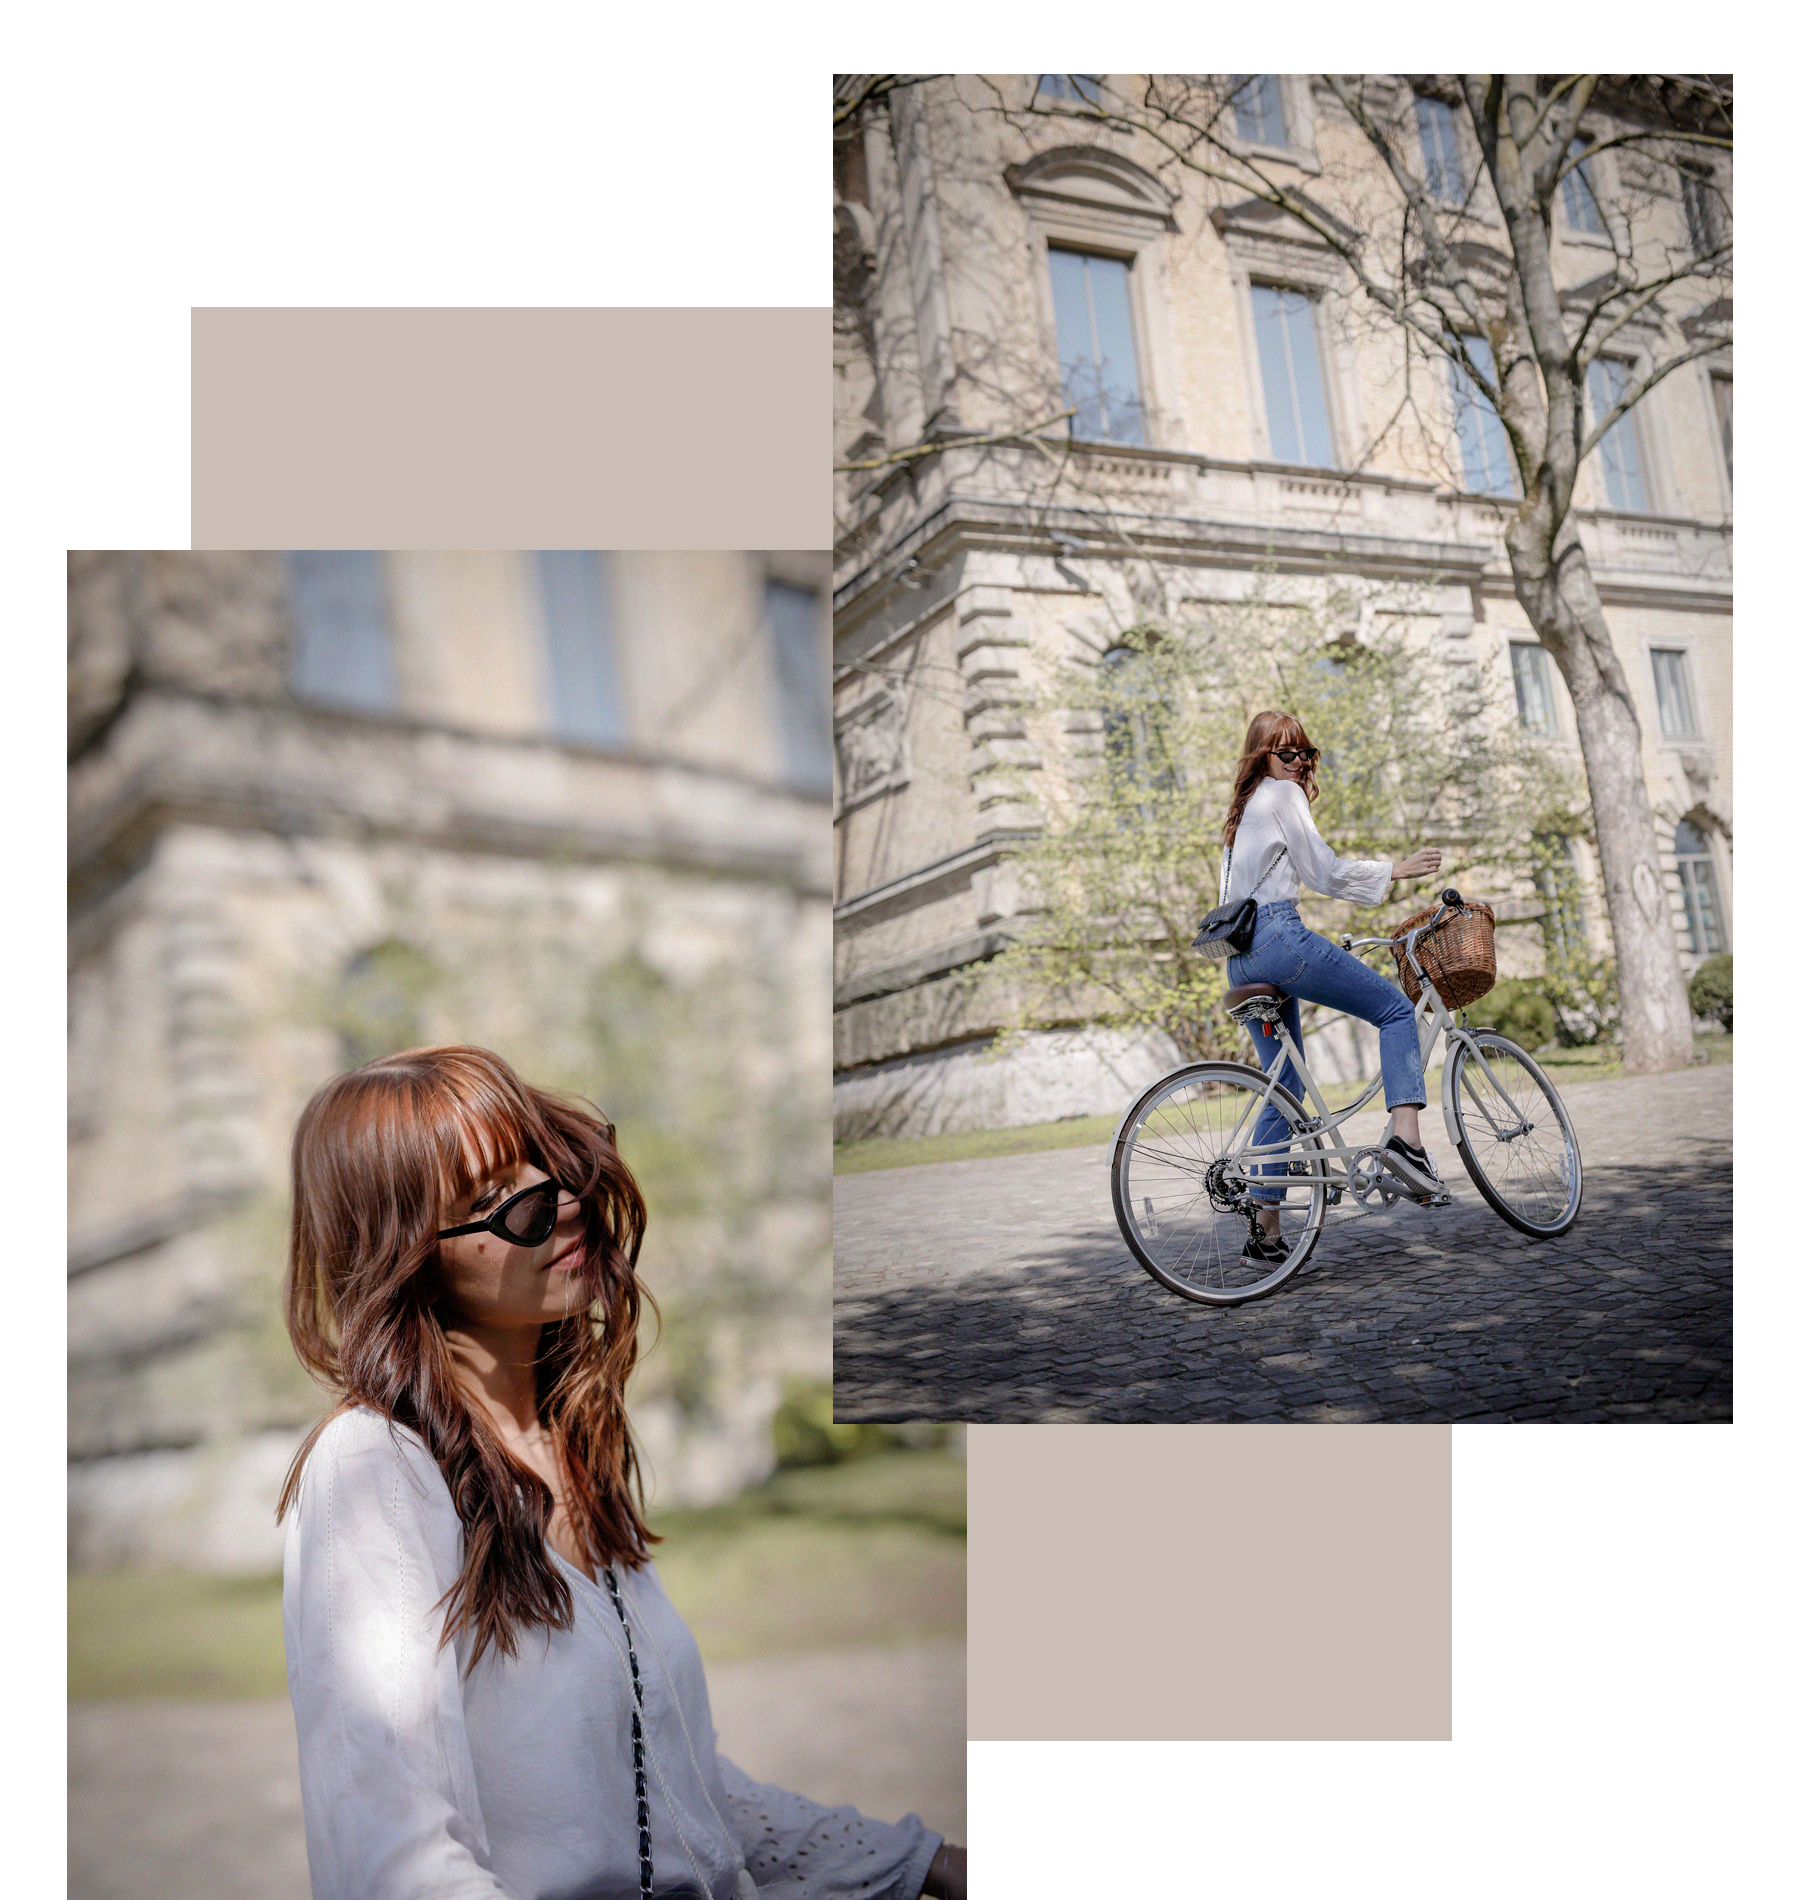 electra bike bicycle fahrrad spring frühling radeln biking loft 7d creme electrabikes catsanddogsblog ricarda schernus modeblog lifestyle blogger styleblog lifestyleblog cats&dogs styleblogger max bechmann fotografie film düsseldorf 6